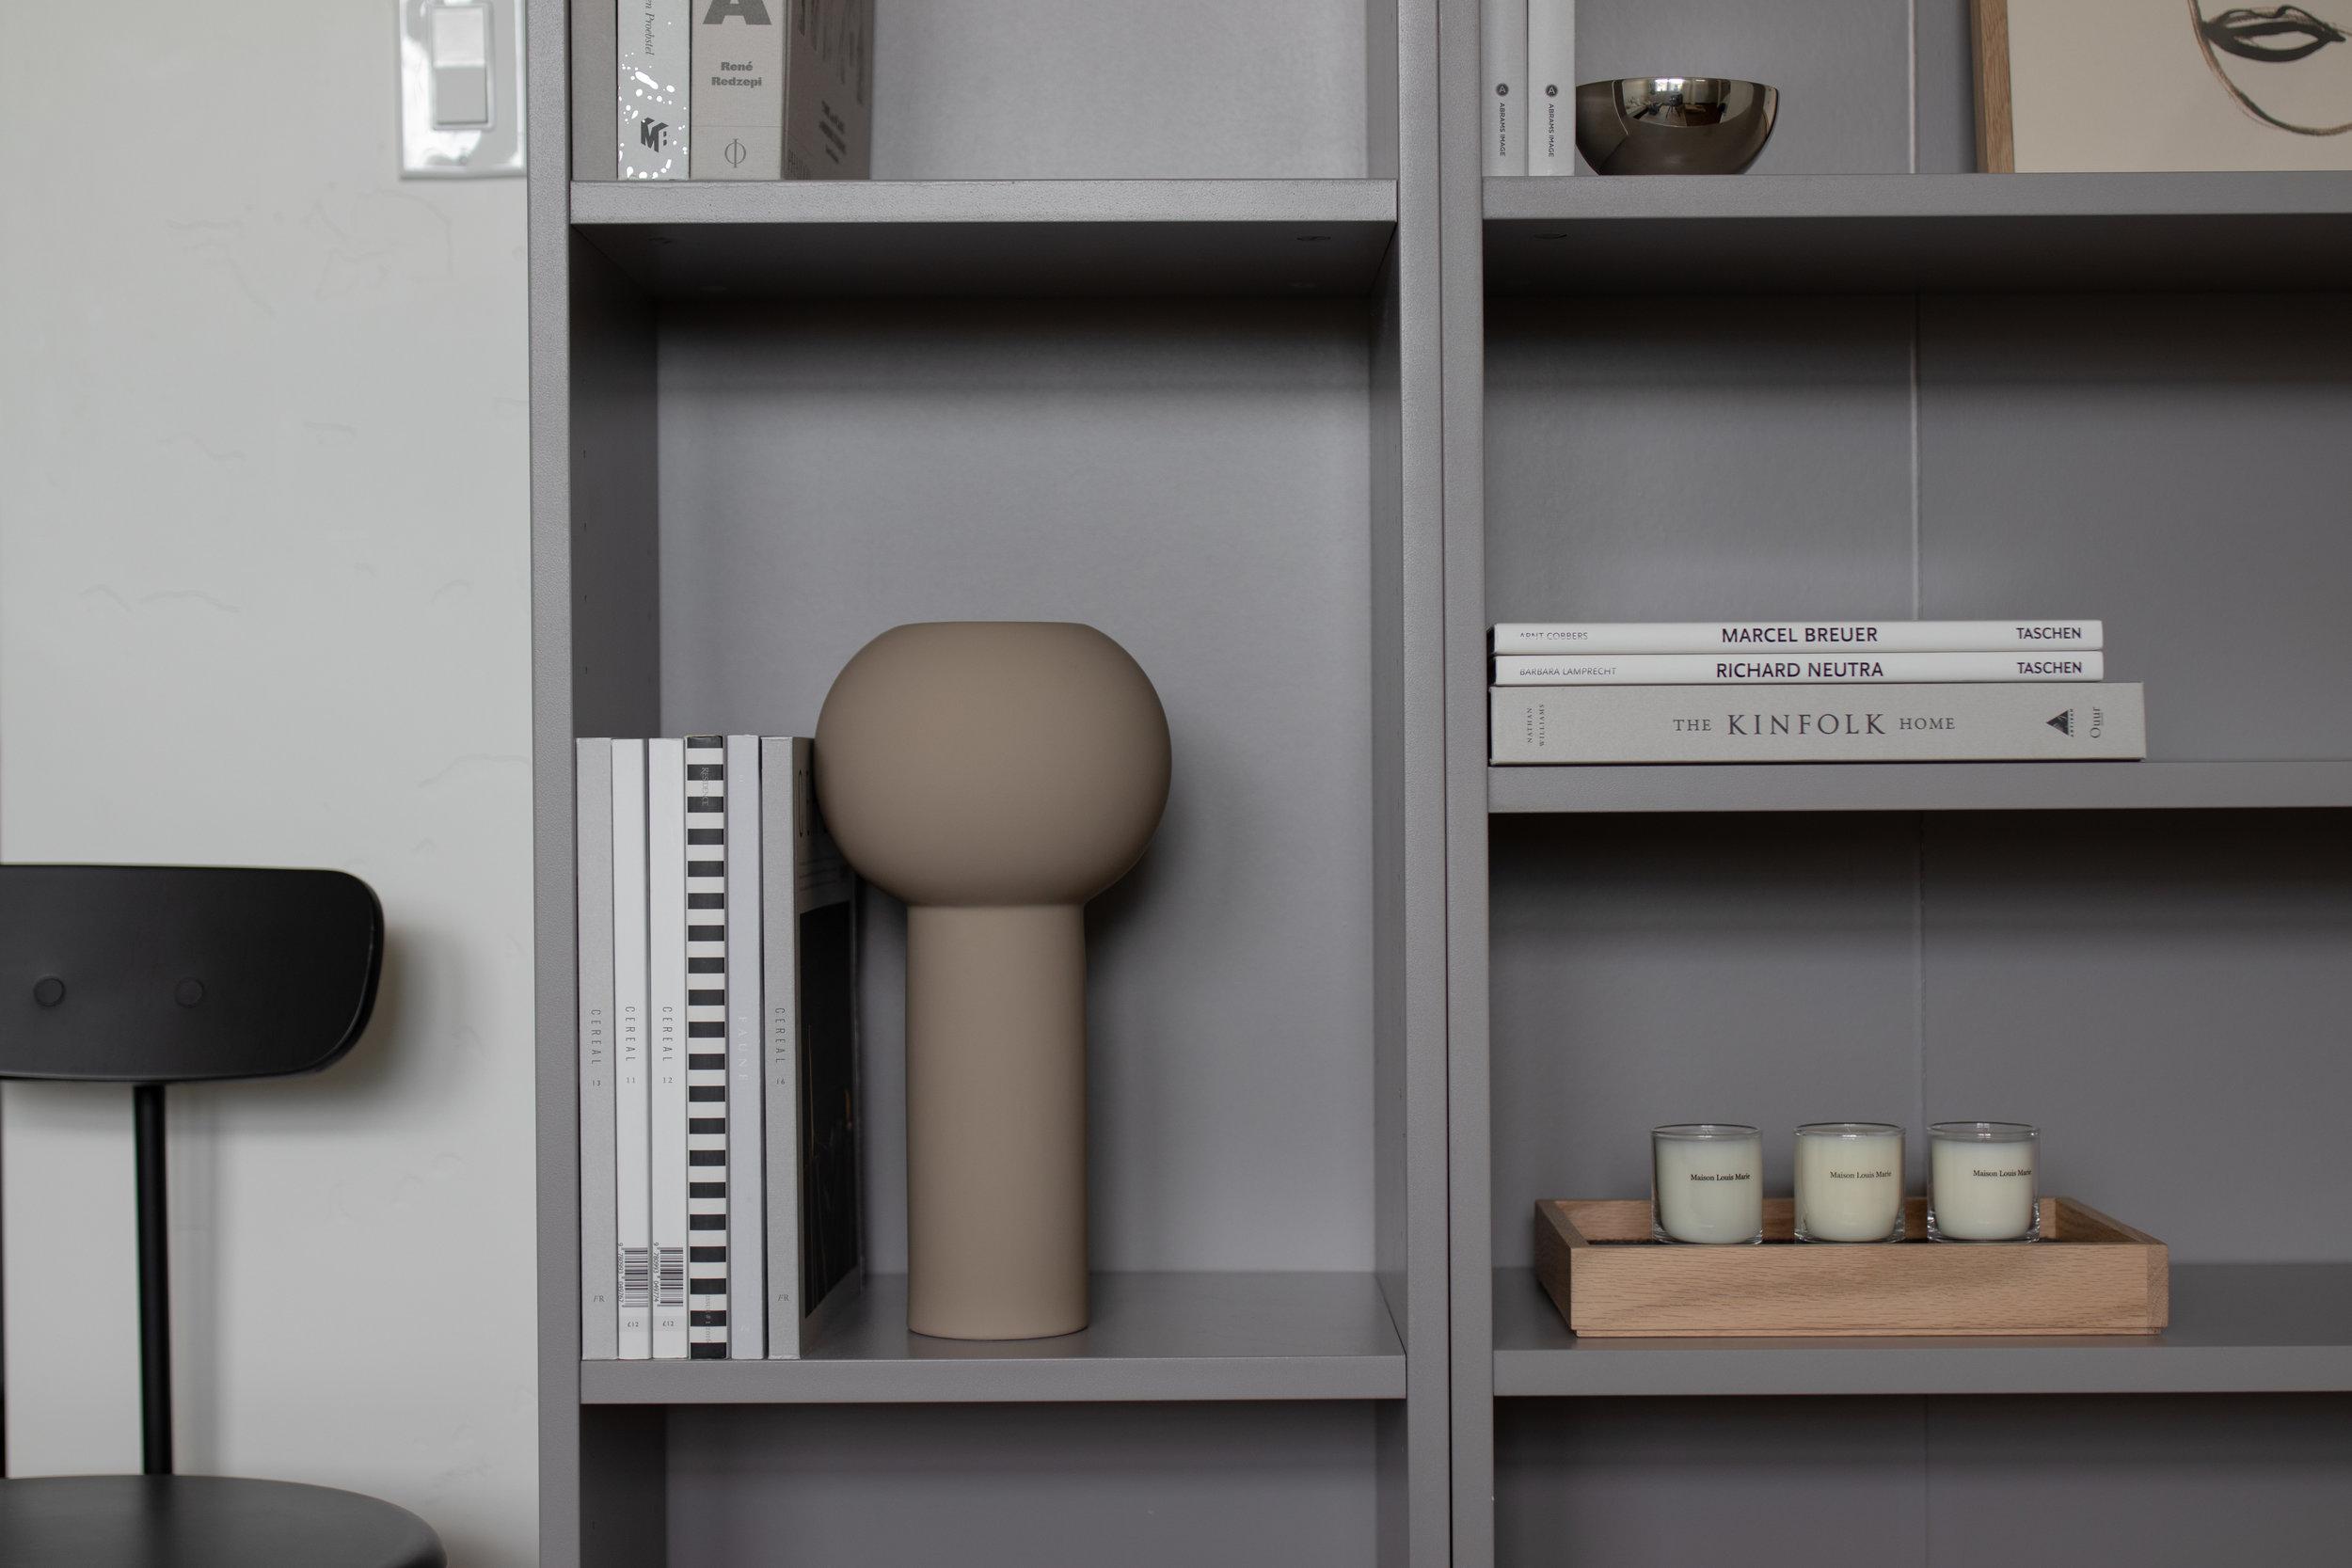 Details on my shelves